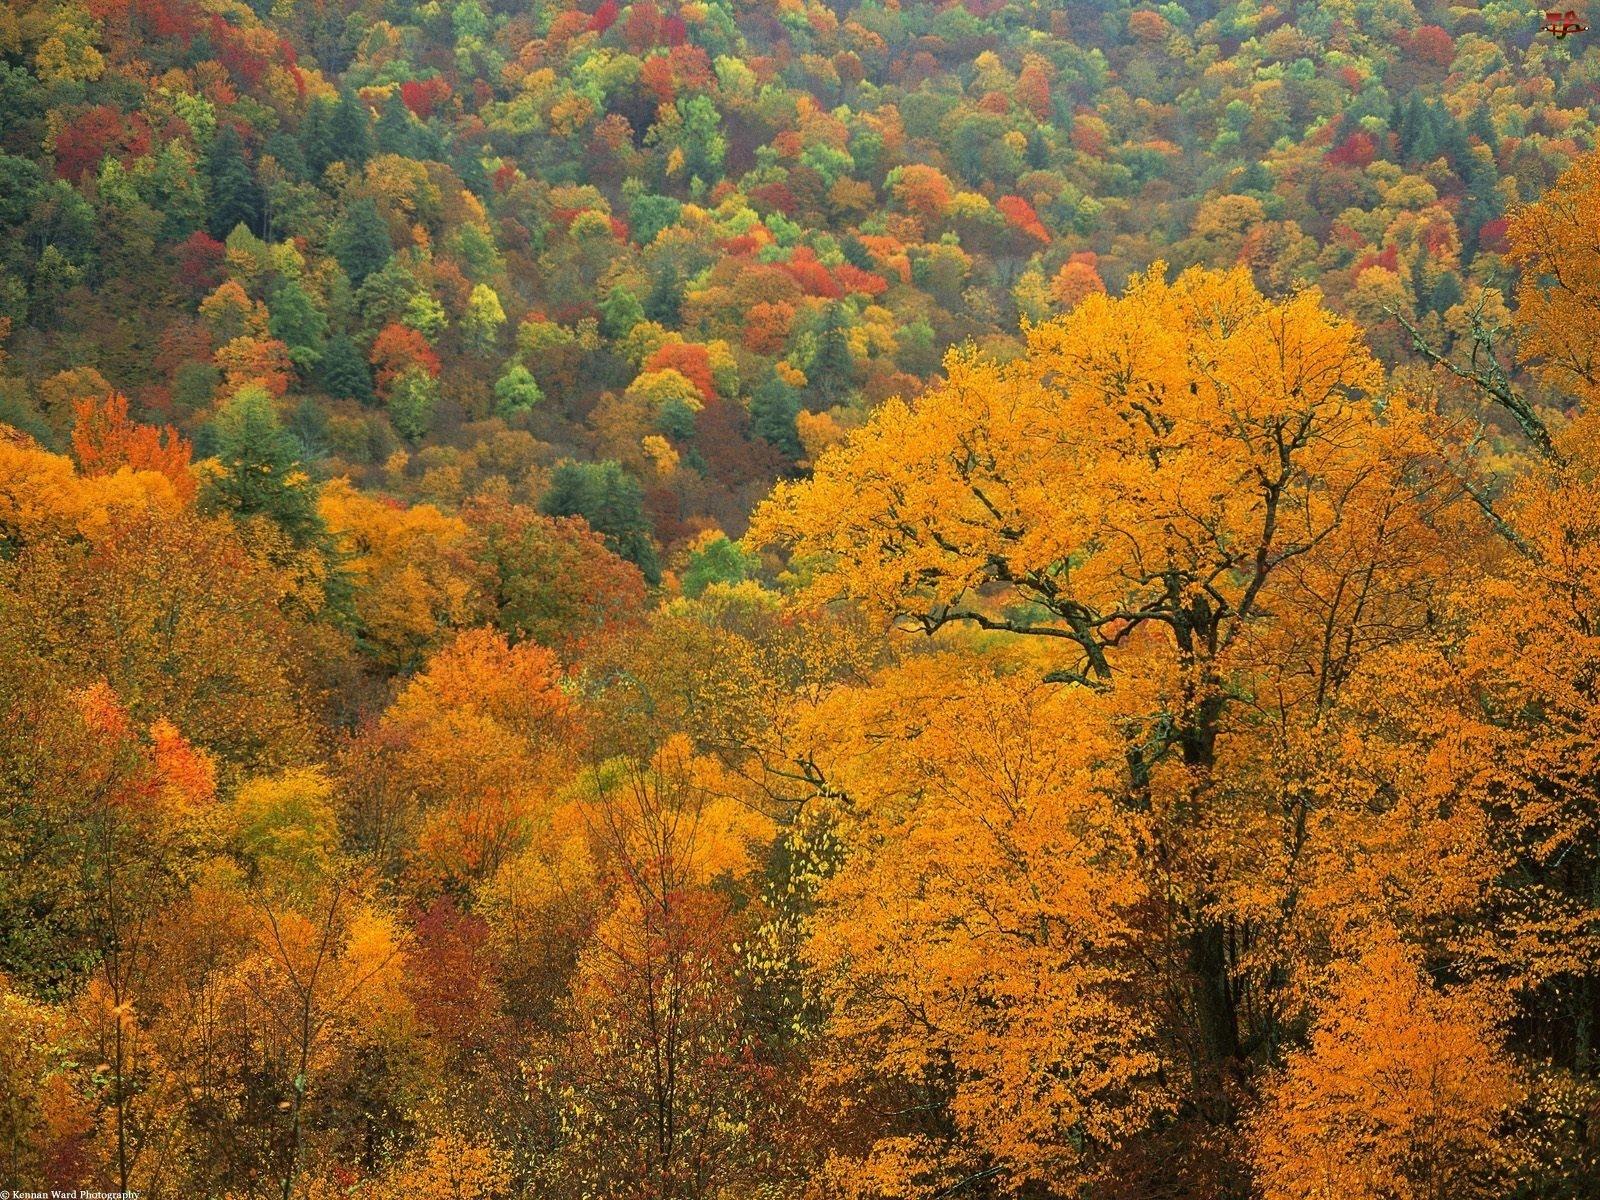 Drzewa, Jesienne, Kolorowe